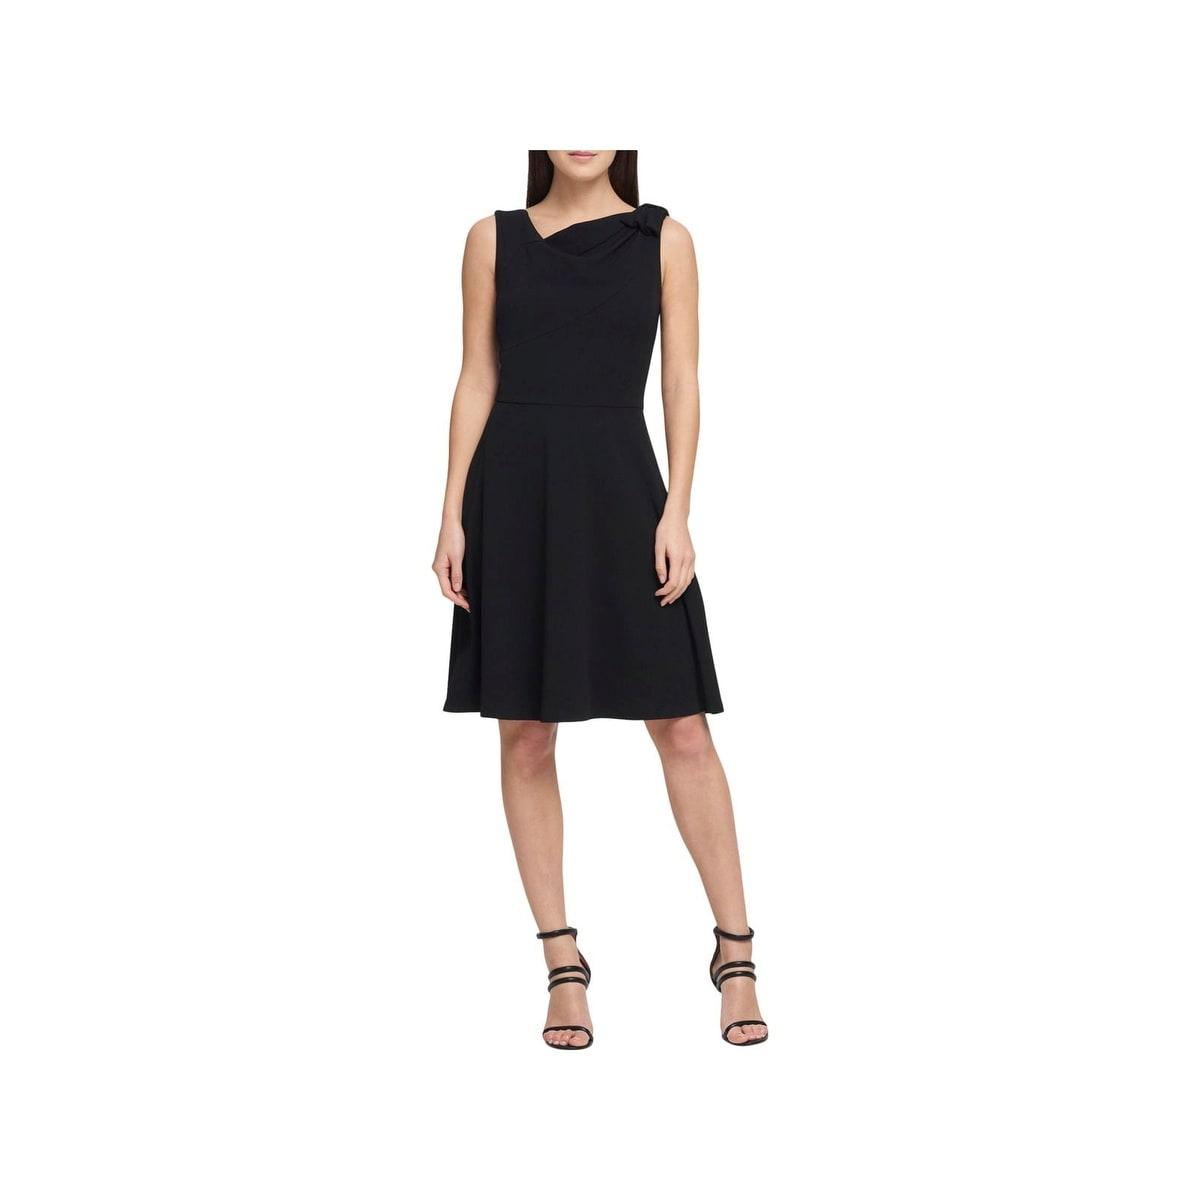 385cf45faa0 DKNY Dresses